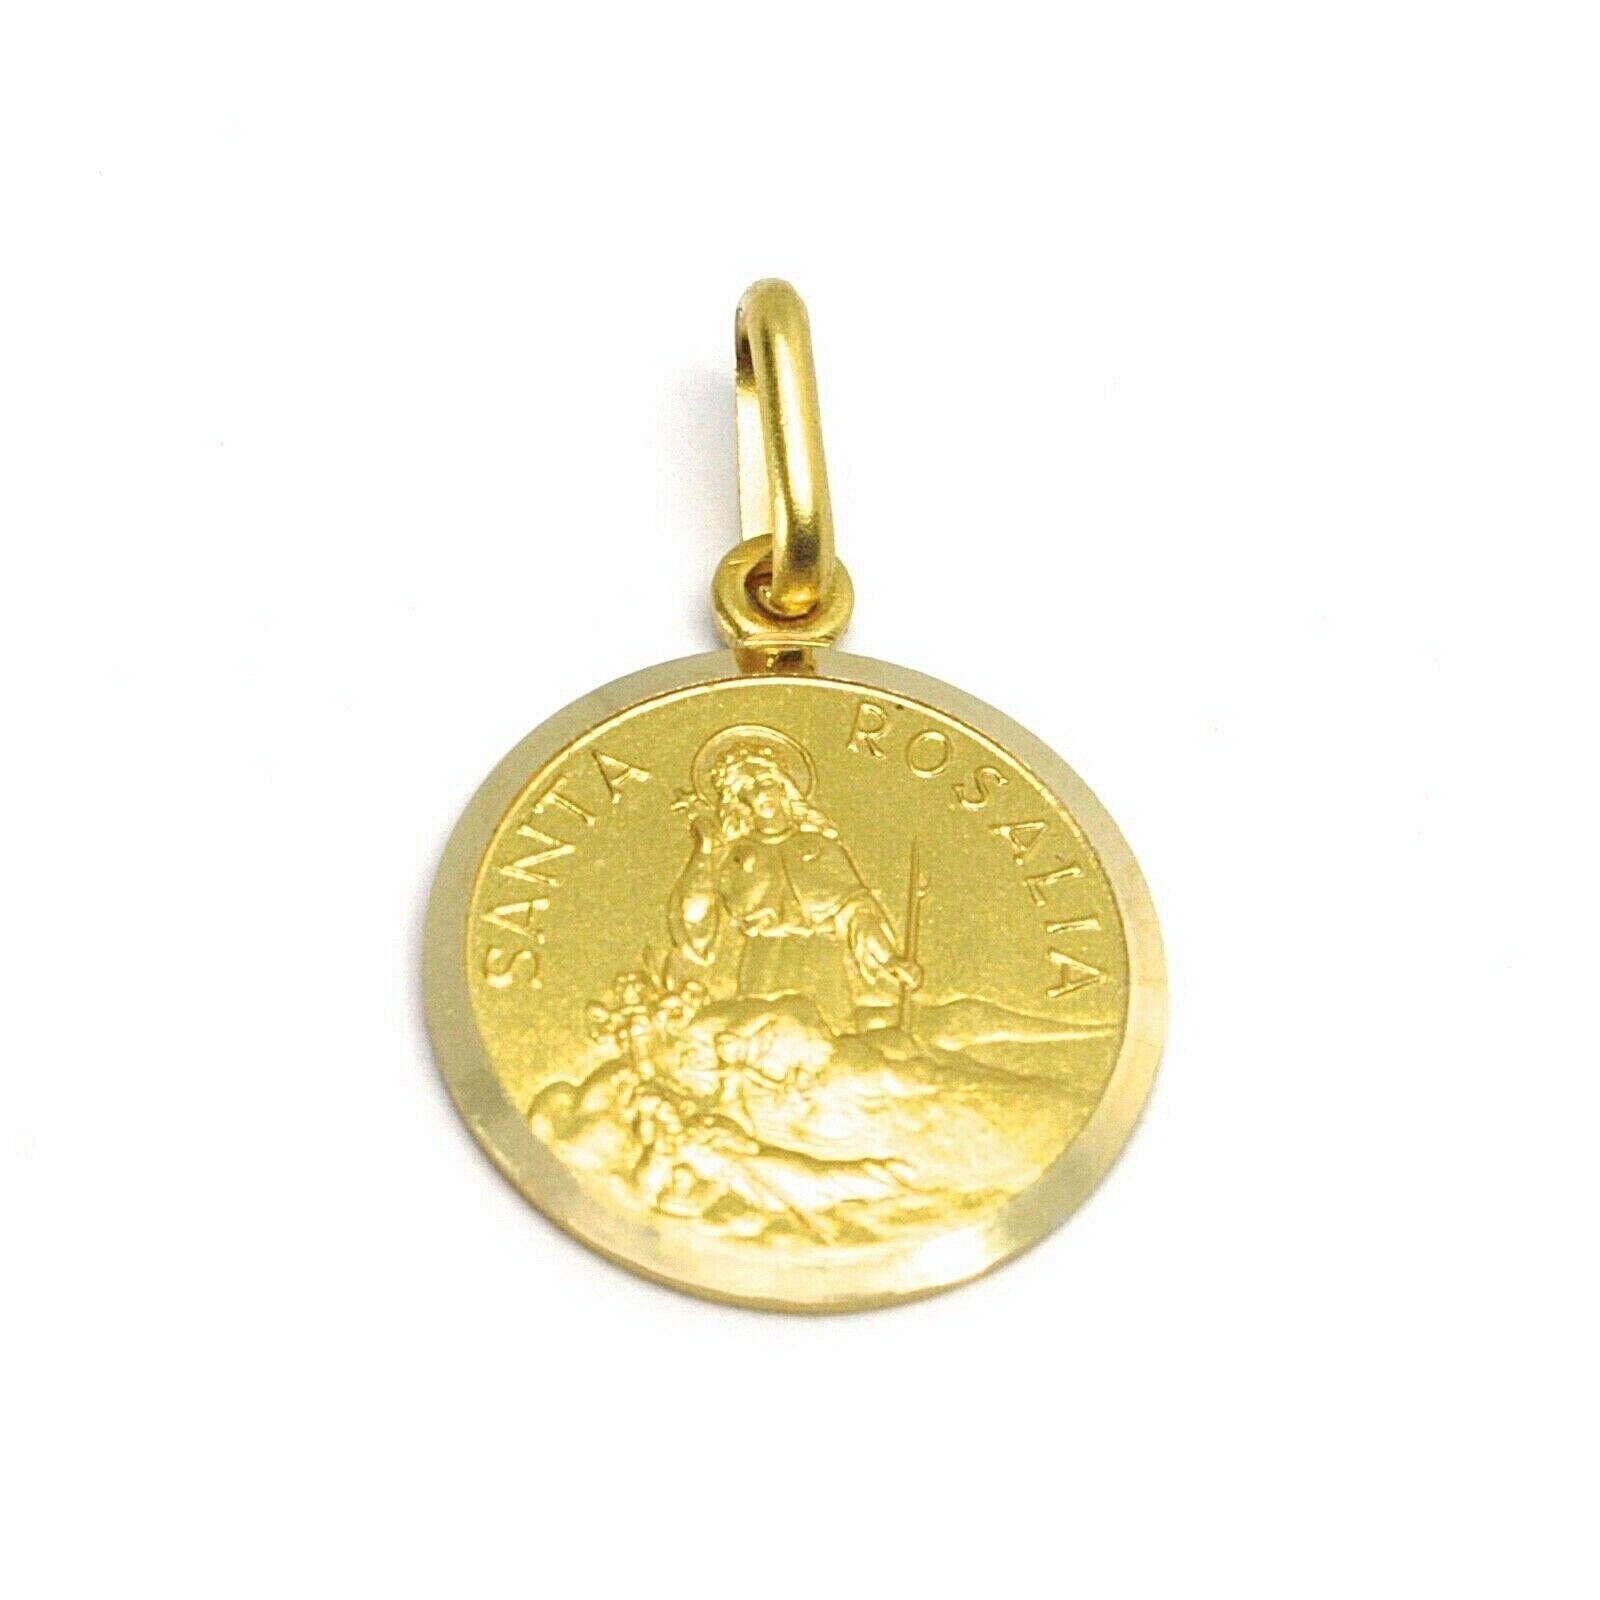 18K YELLOW GOLD MEDAL PENDANT, SAINT SANTA ROSALIA SMALL 14mm VERY DETAILED